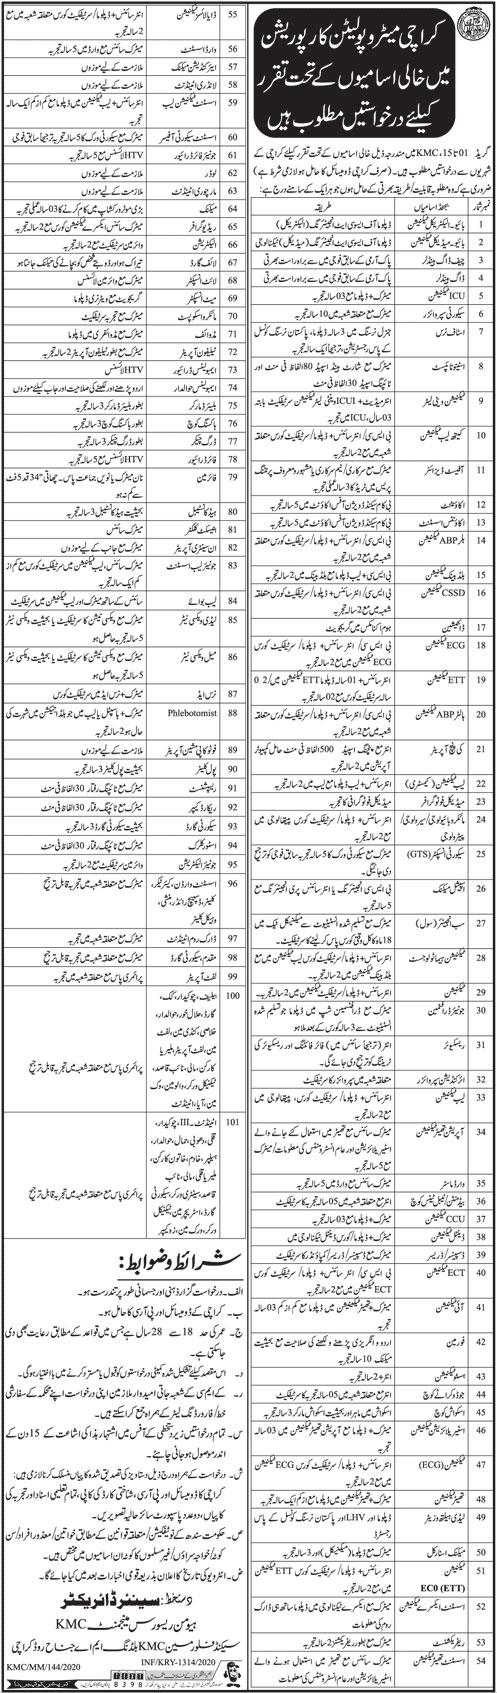 Karachi Metropolitan Corporation Jobs 24 May 2020